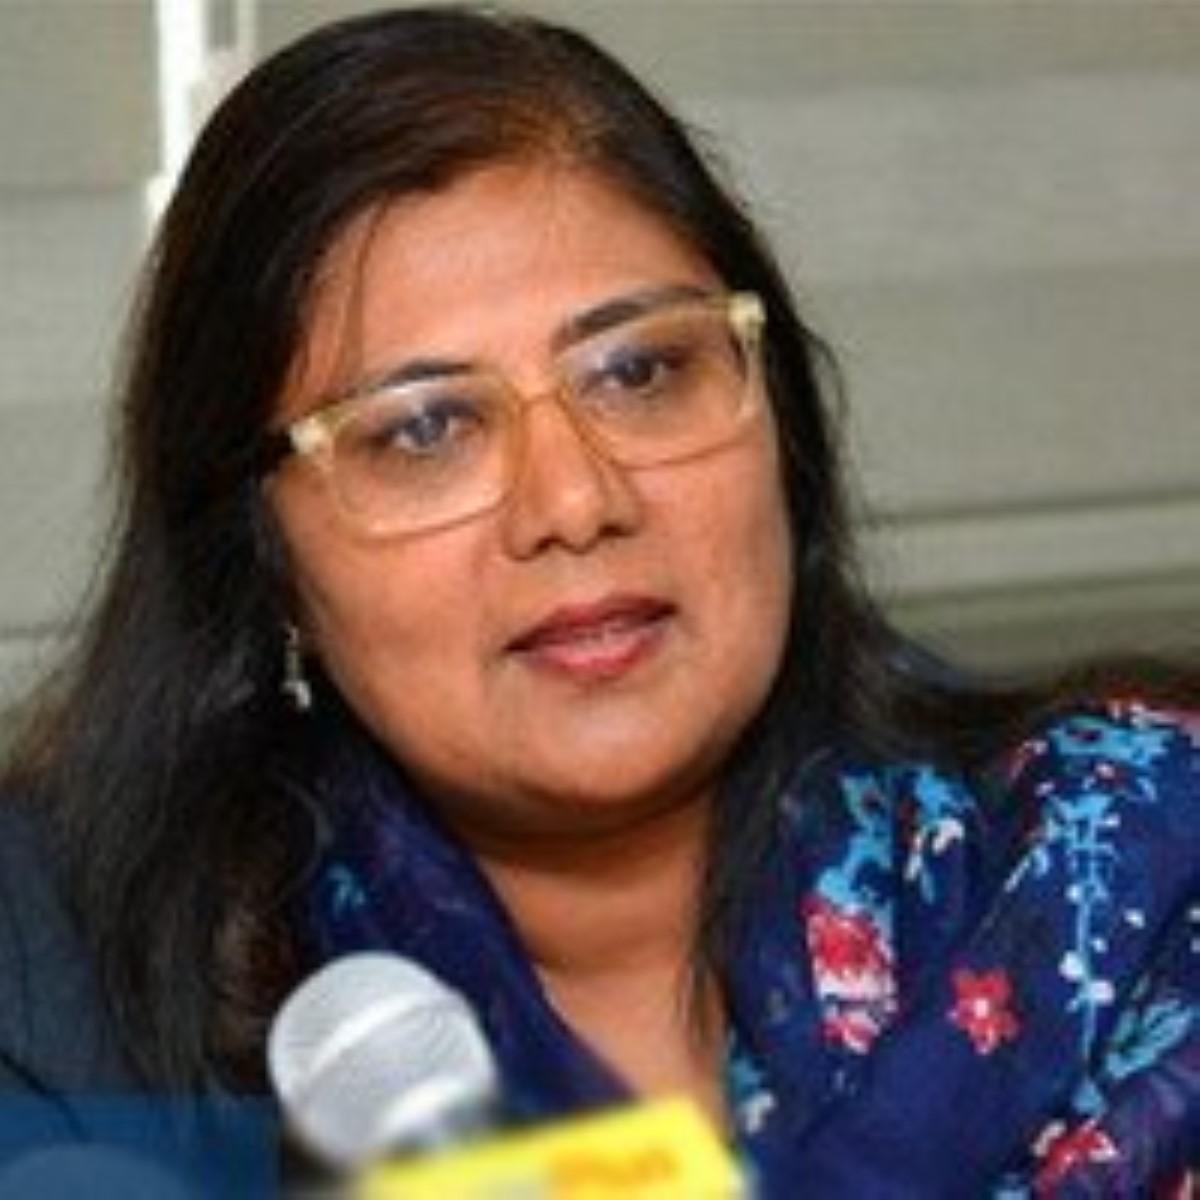 Tourism Authority : La directrice Khoudijah Maudarbocus-Boodoo prend la porte de sortie